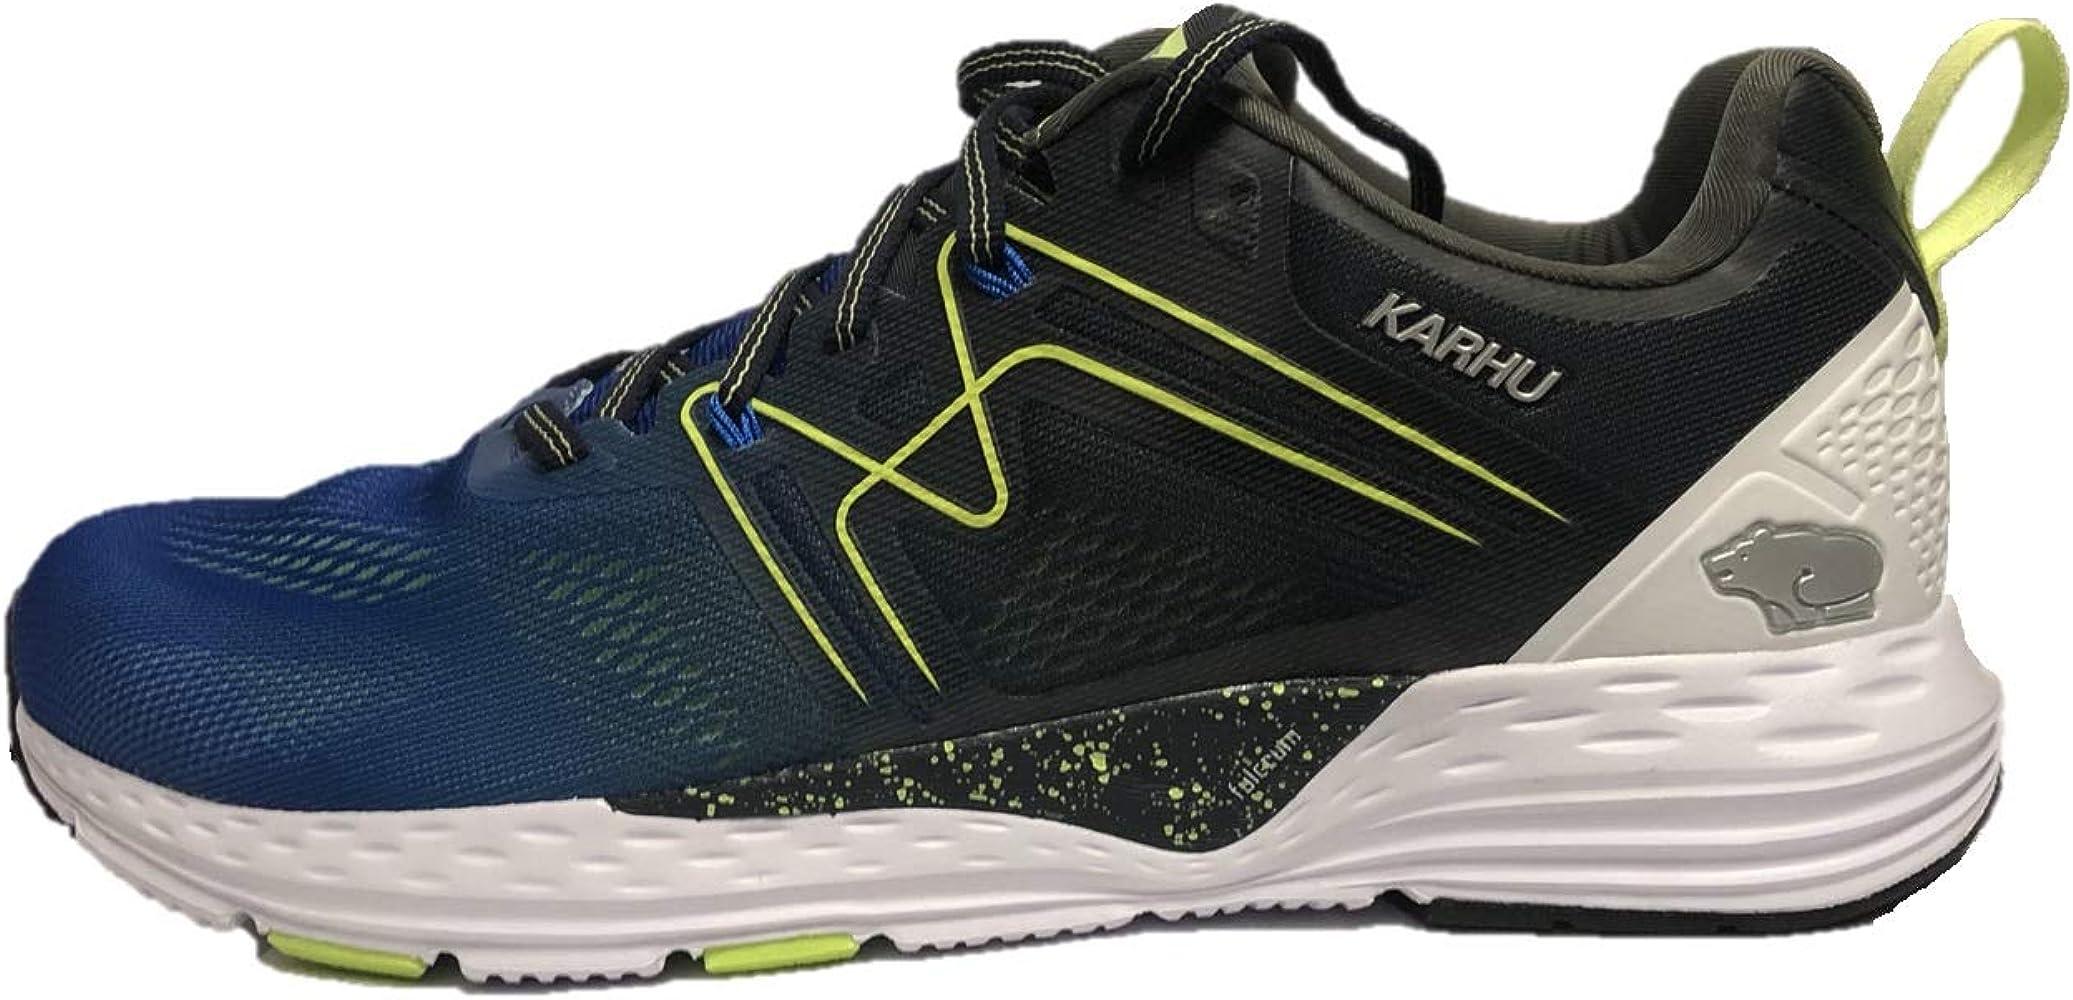 Karhu Fusion Ortix - Zapatillas de Running para Hombre, Color Azul ...